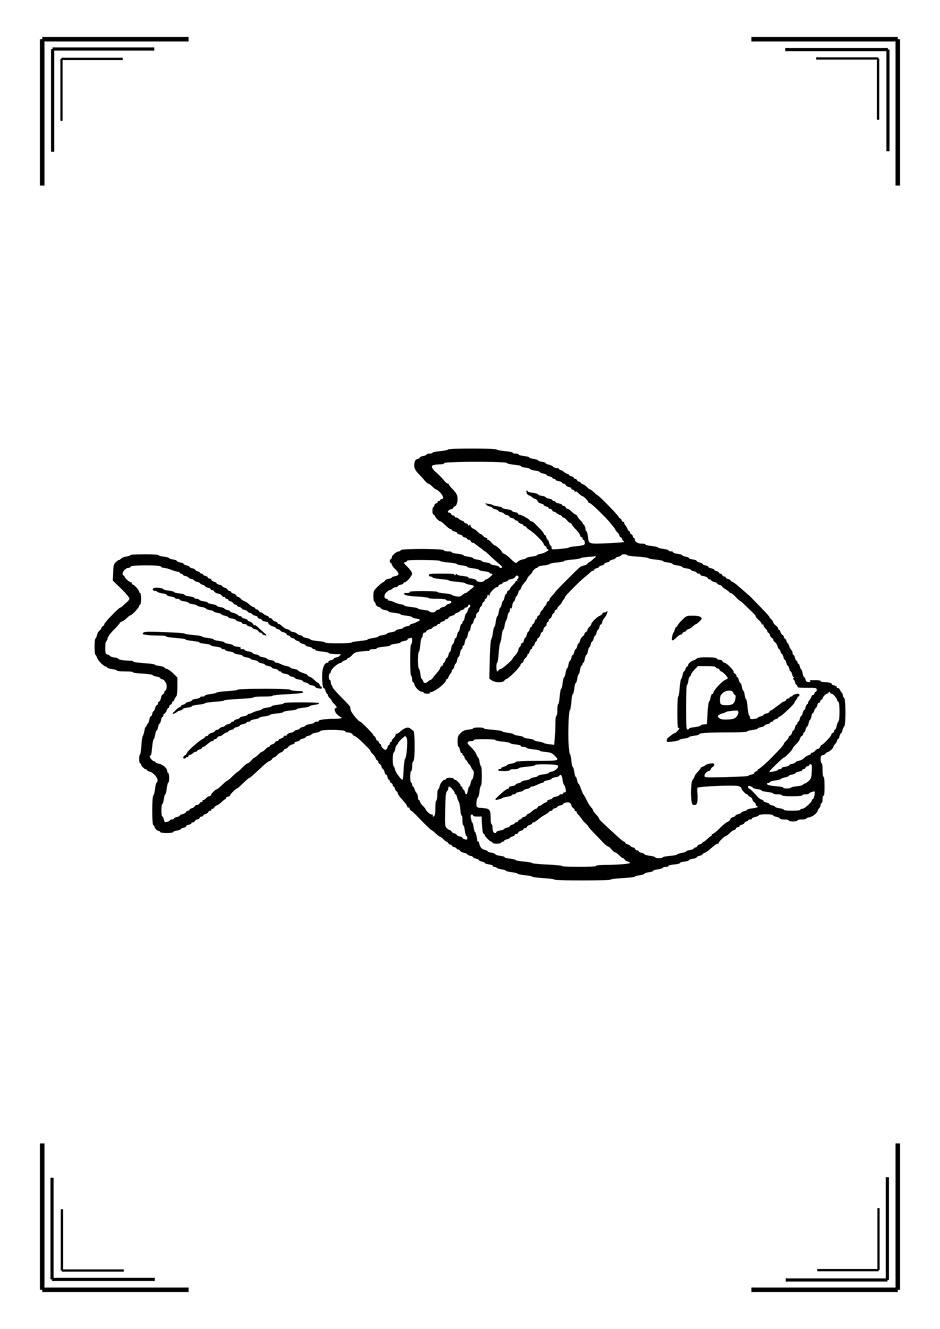 Раскраска: рыбка-девочка — raskraski-a4.ru